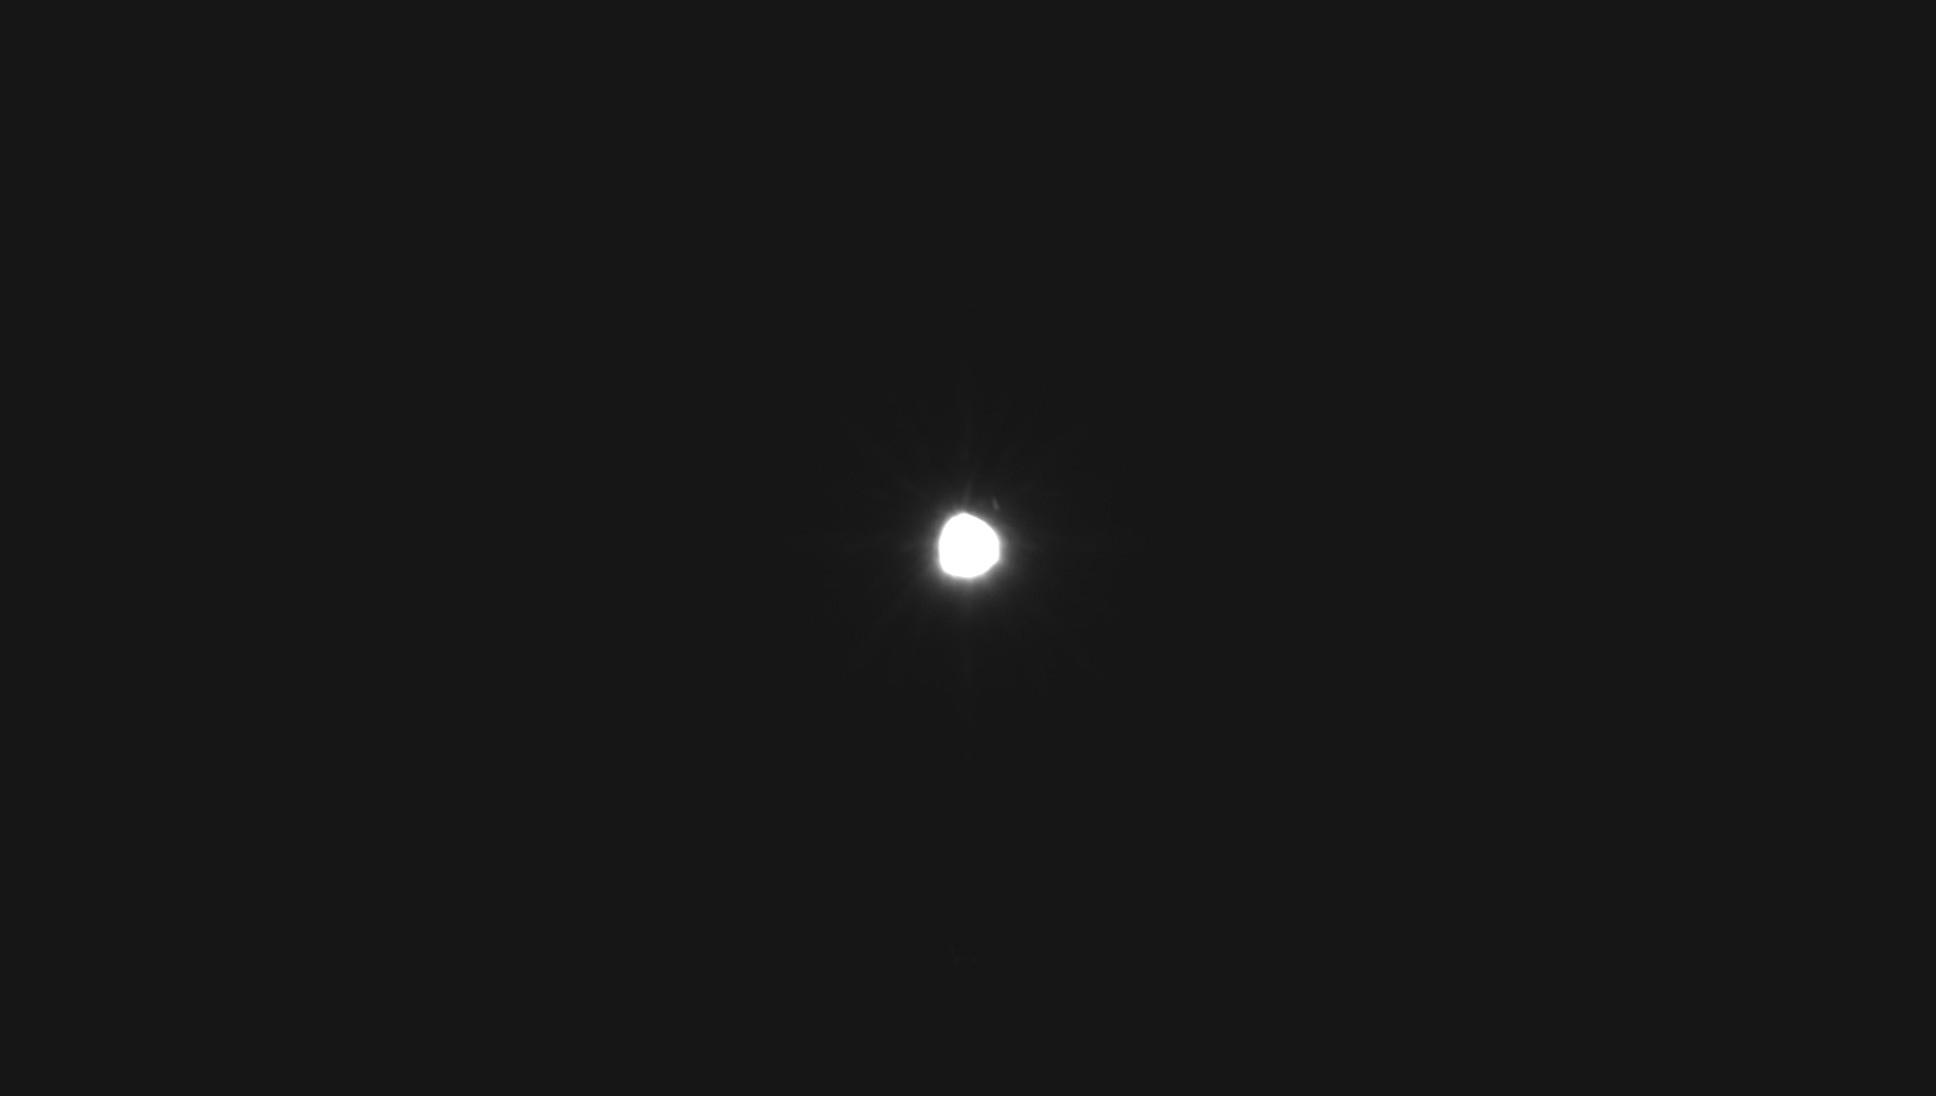 Sirius AB 2020-03-18-2003_5-CapObj TER.jpg